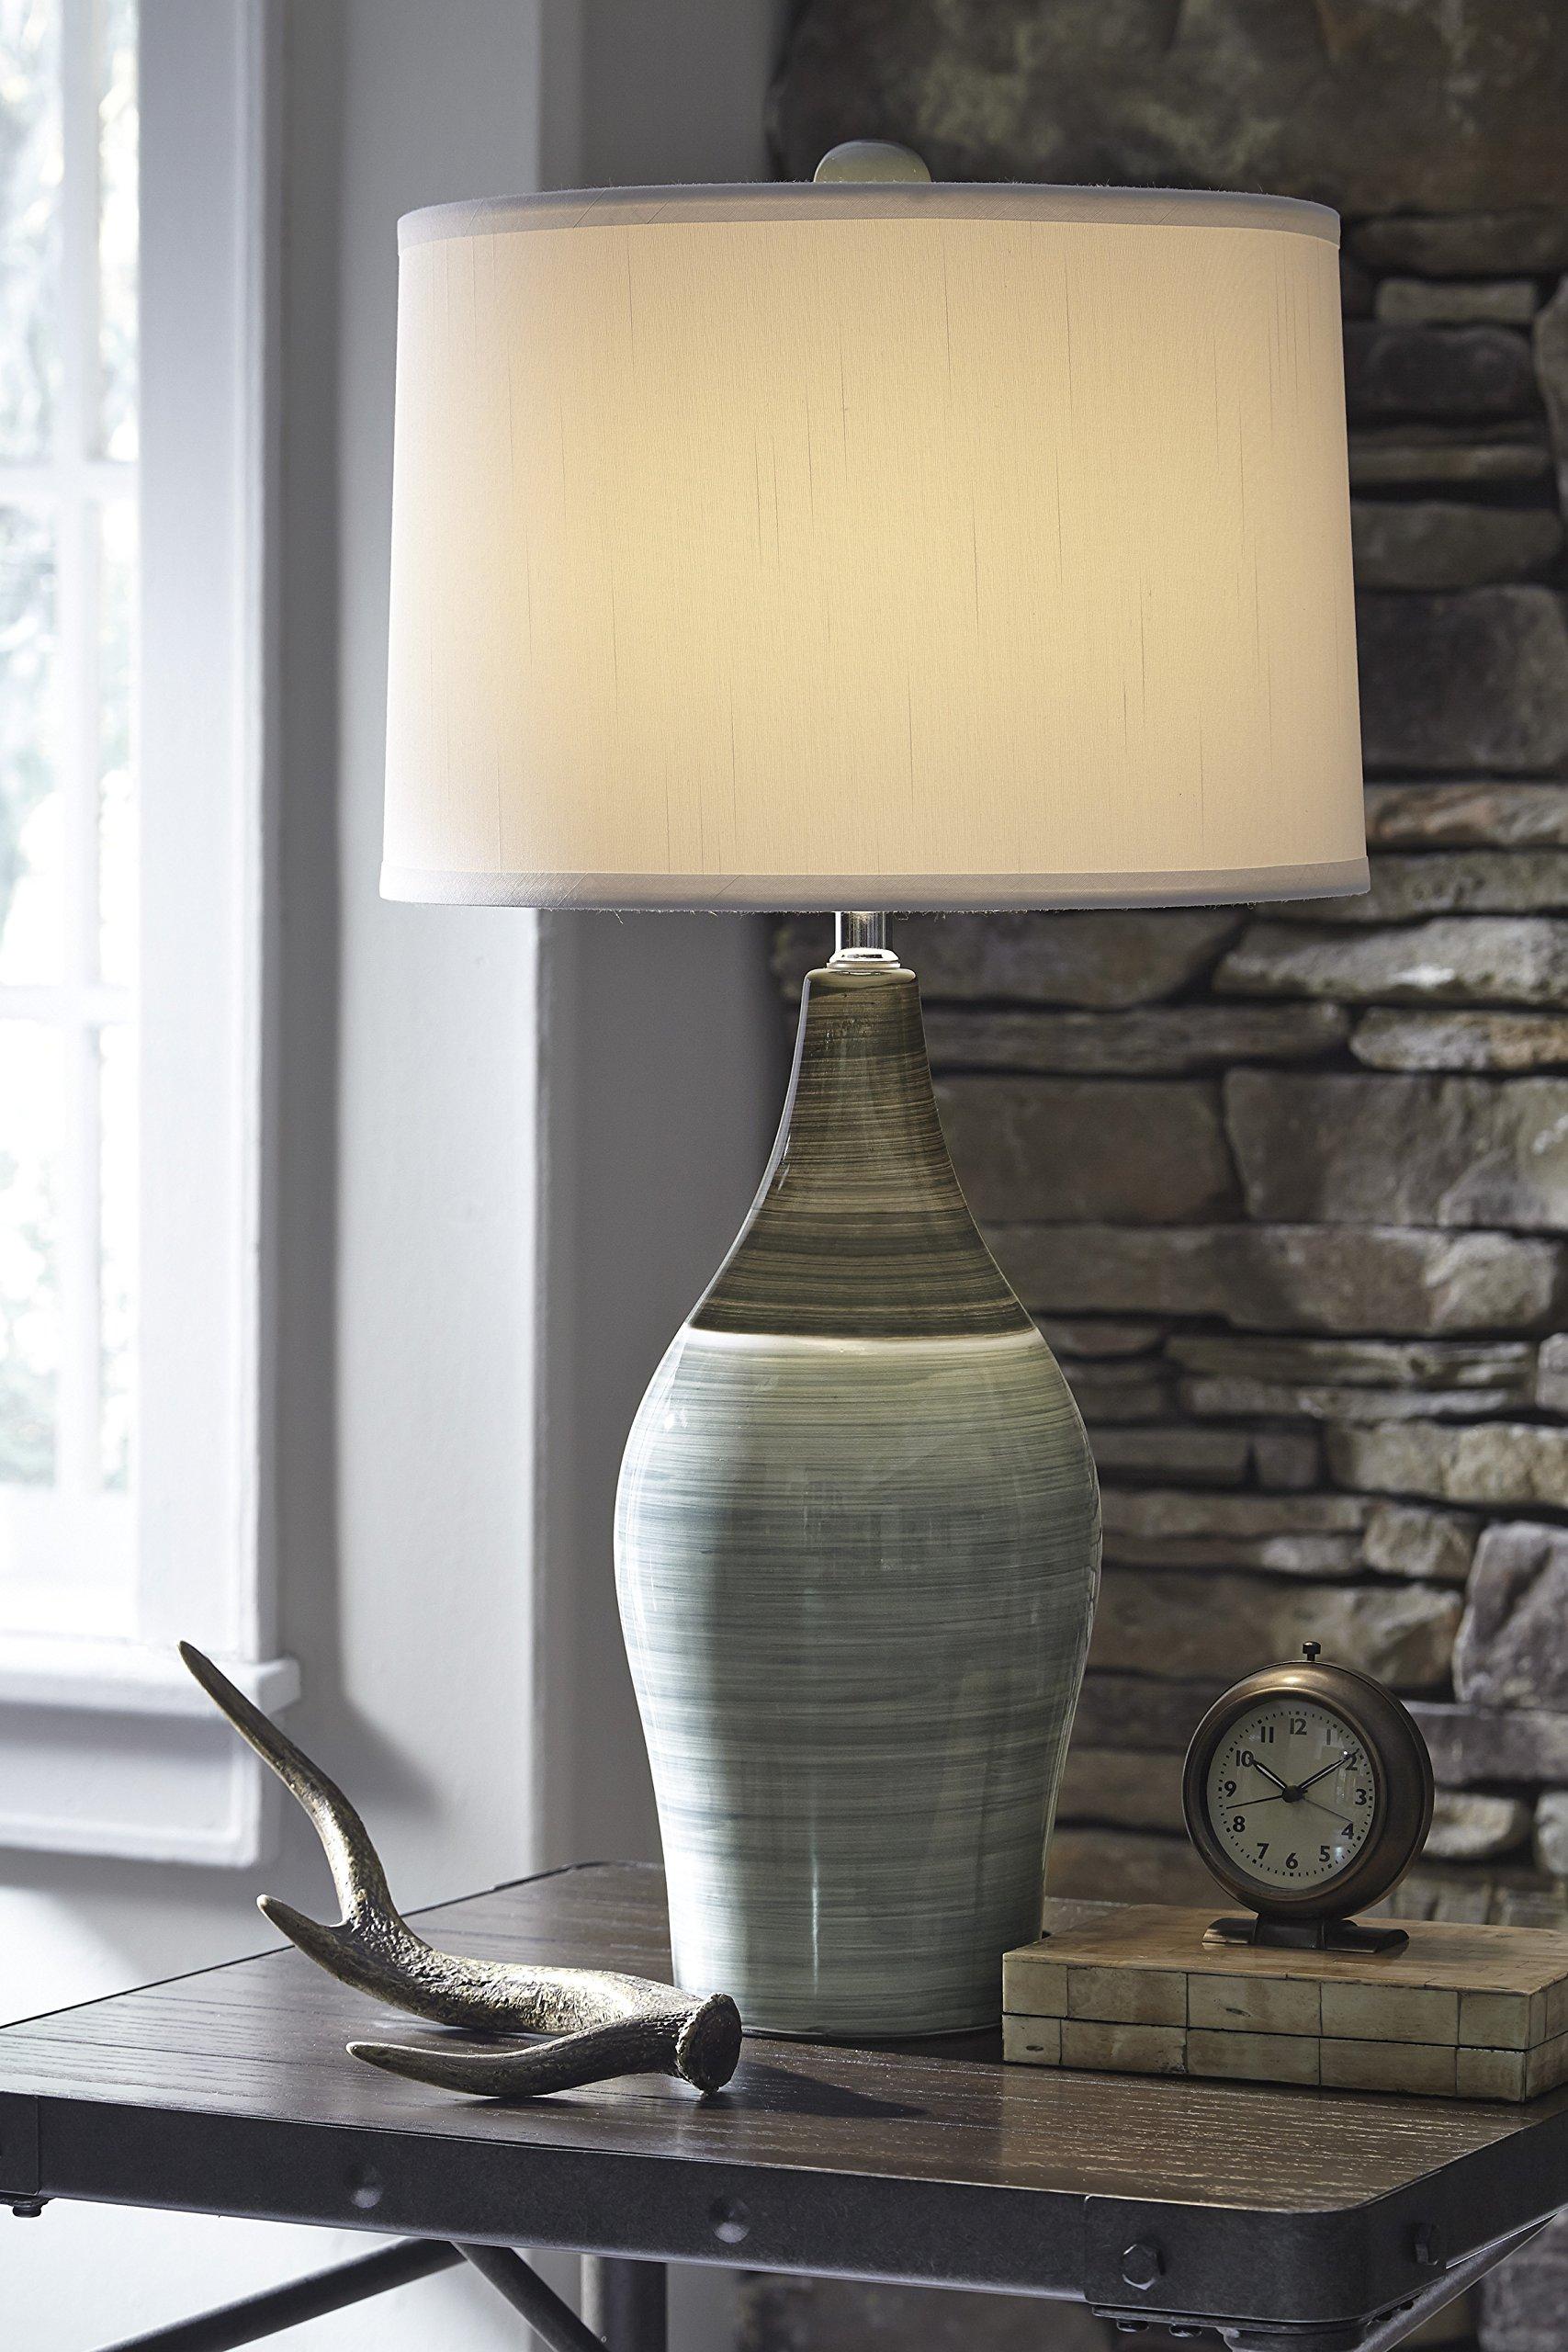 Ashley Furniture Signature Design -  Niobe Ceramic Table Lamp - Set of 2 - Multicolored/Gray by Signature Design by Ashley (Image #3)